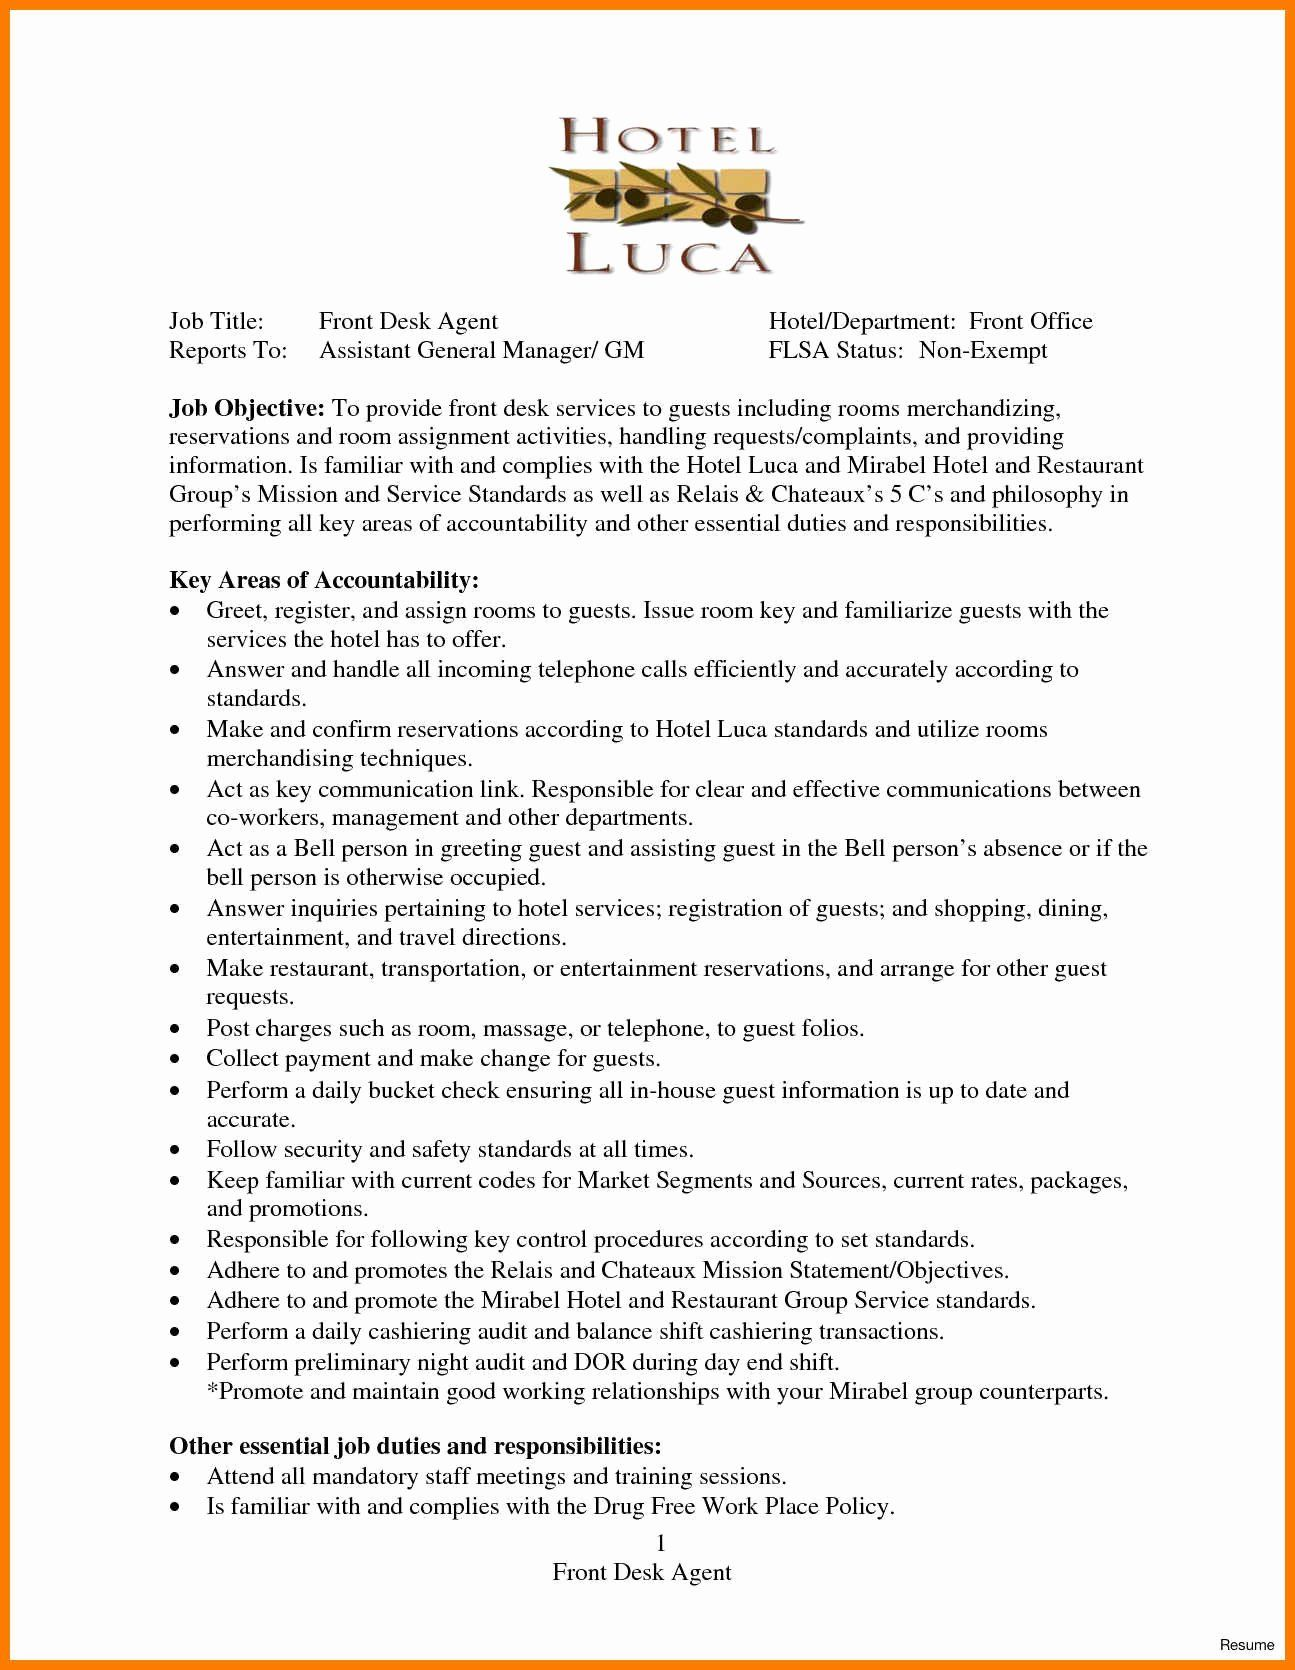 Ramp Agent Job Description Resume Inspirational 13 14 Car Rental Agent Job Description Resume In 2020 Front Desk Agent Receptionist Jobs Front Desk Hotel